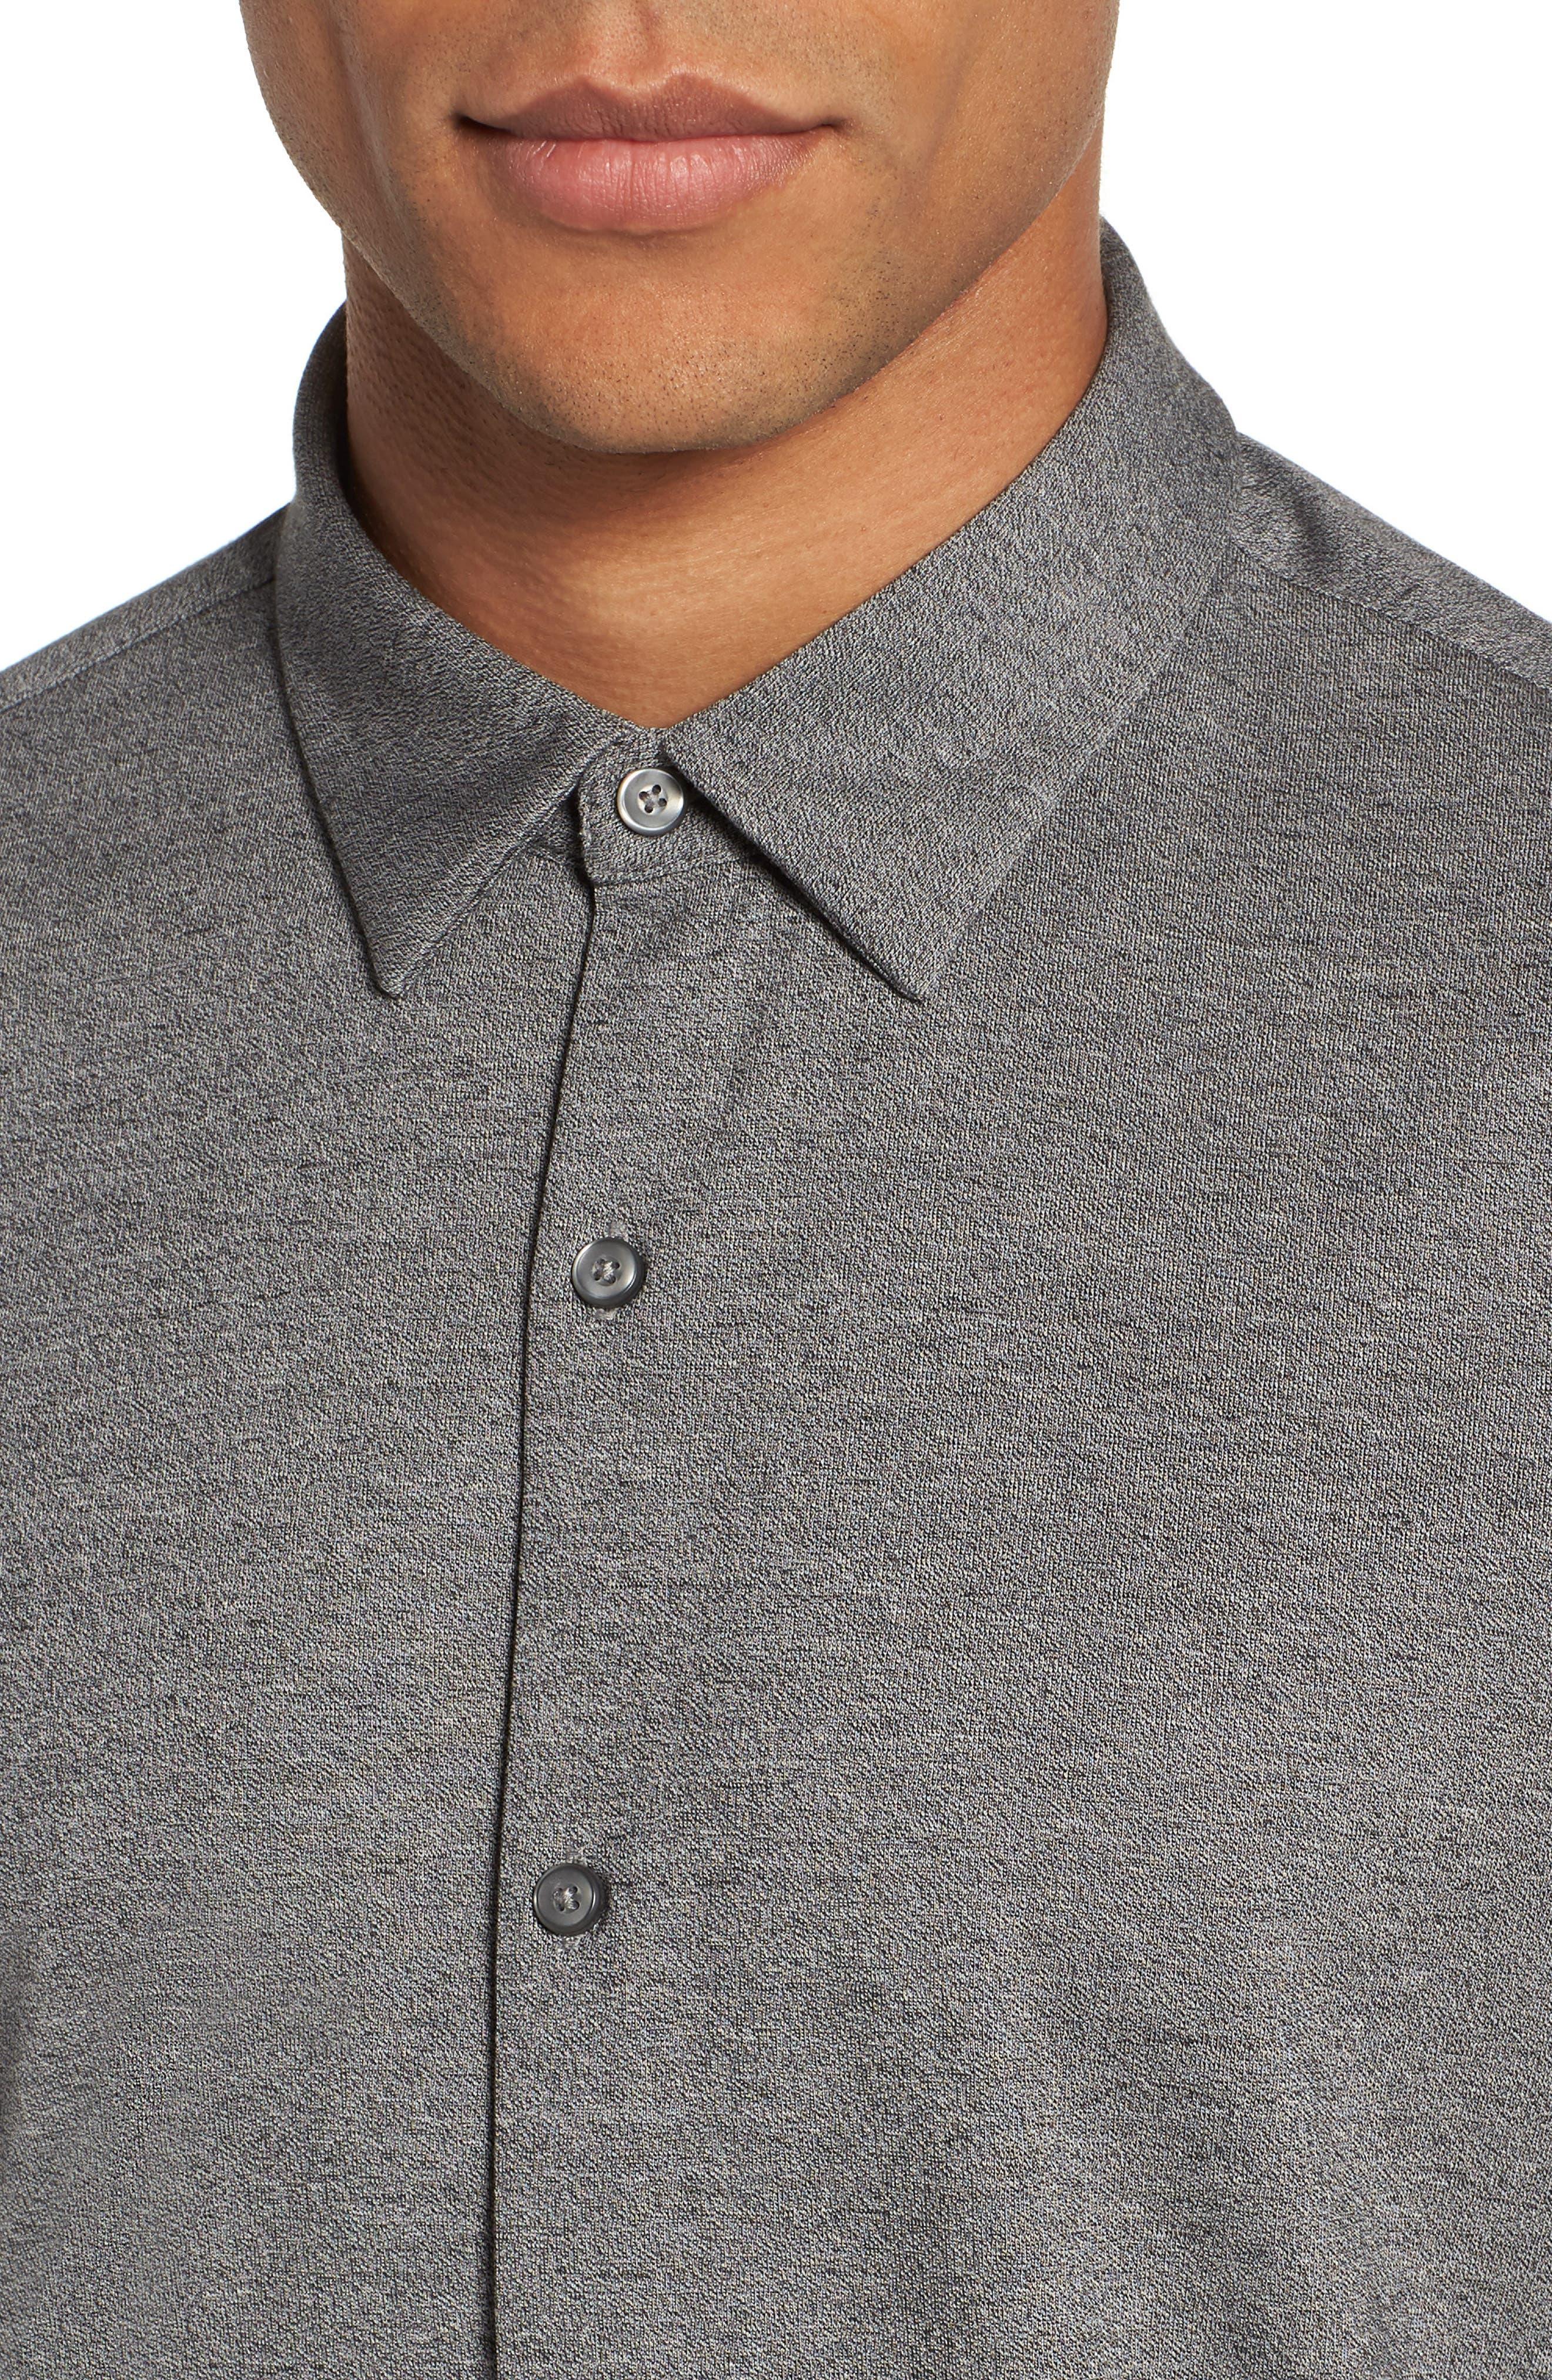 Knit Sport Shirt,                             Alternate thumbnail 4, color,                             Grey Micro Black Jaspe